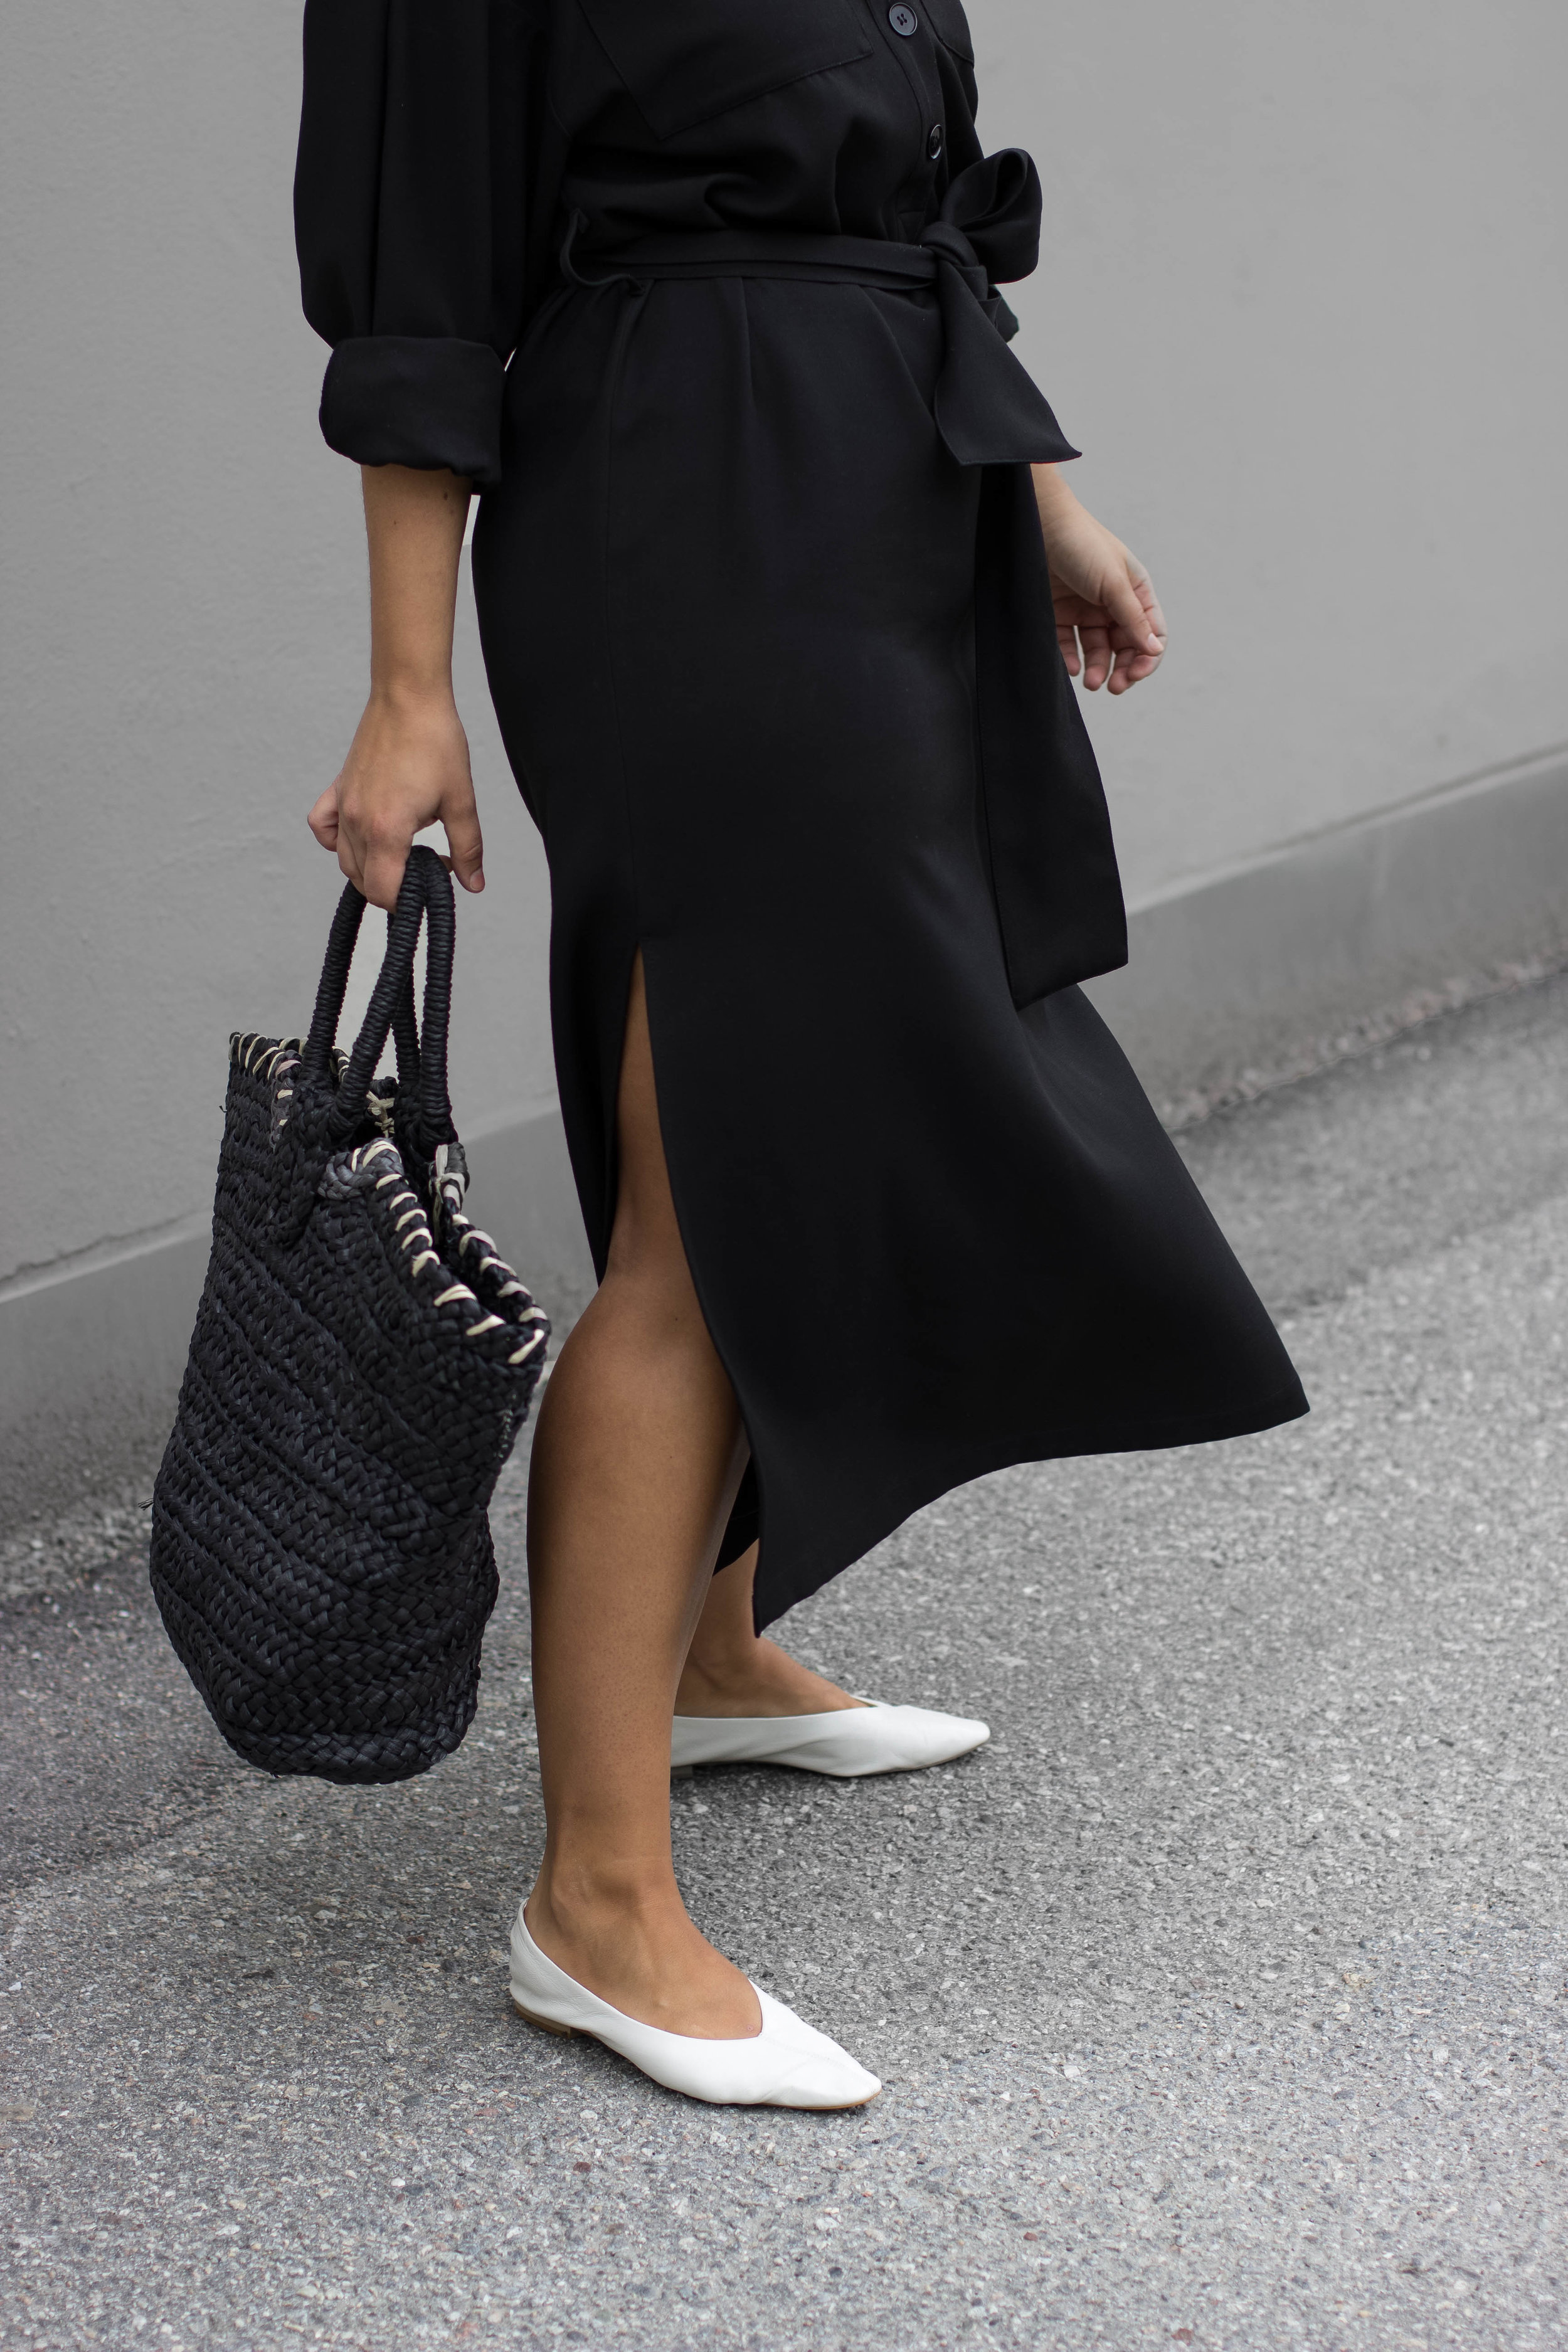 WEARING// Dress H&M / Shoes MANGO / Straw Bag    WOMEN'S SECRET